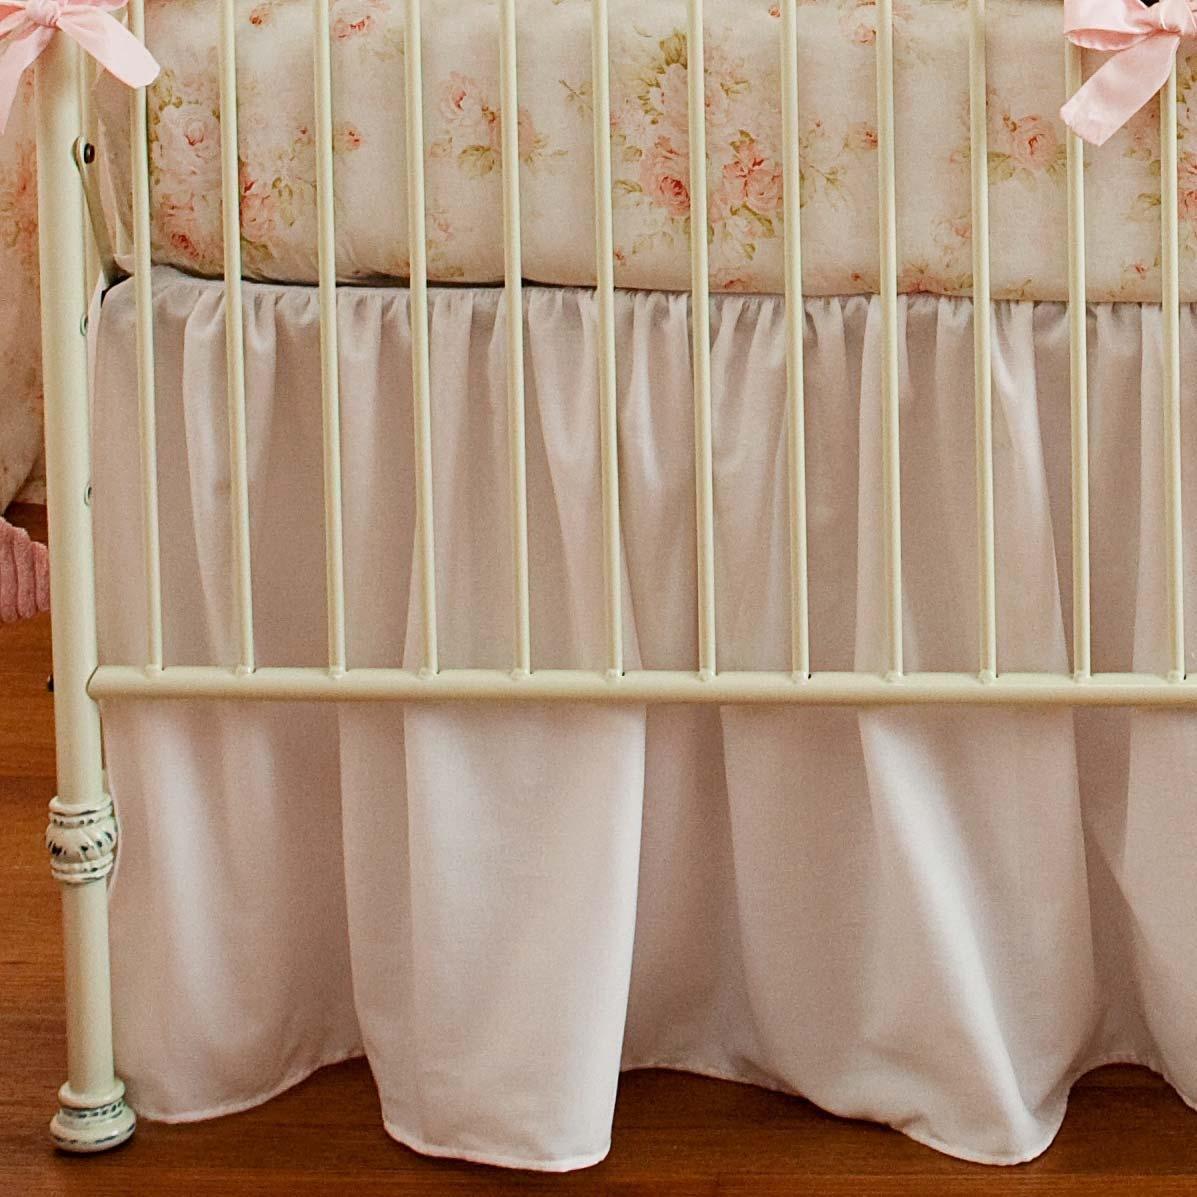 Carousel Designs Shabby Chenille 2-Piece Crib Bedding Set by Carousel Designs   B00MNST3VO